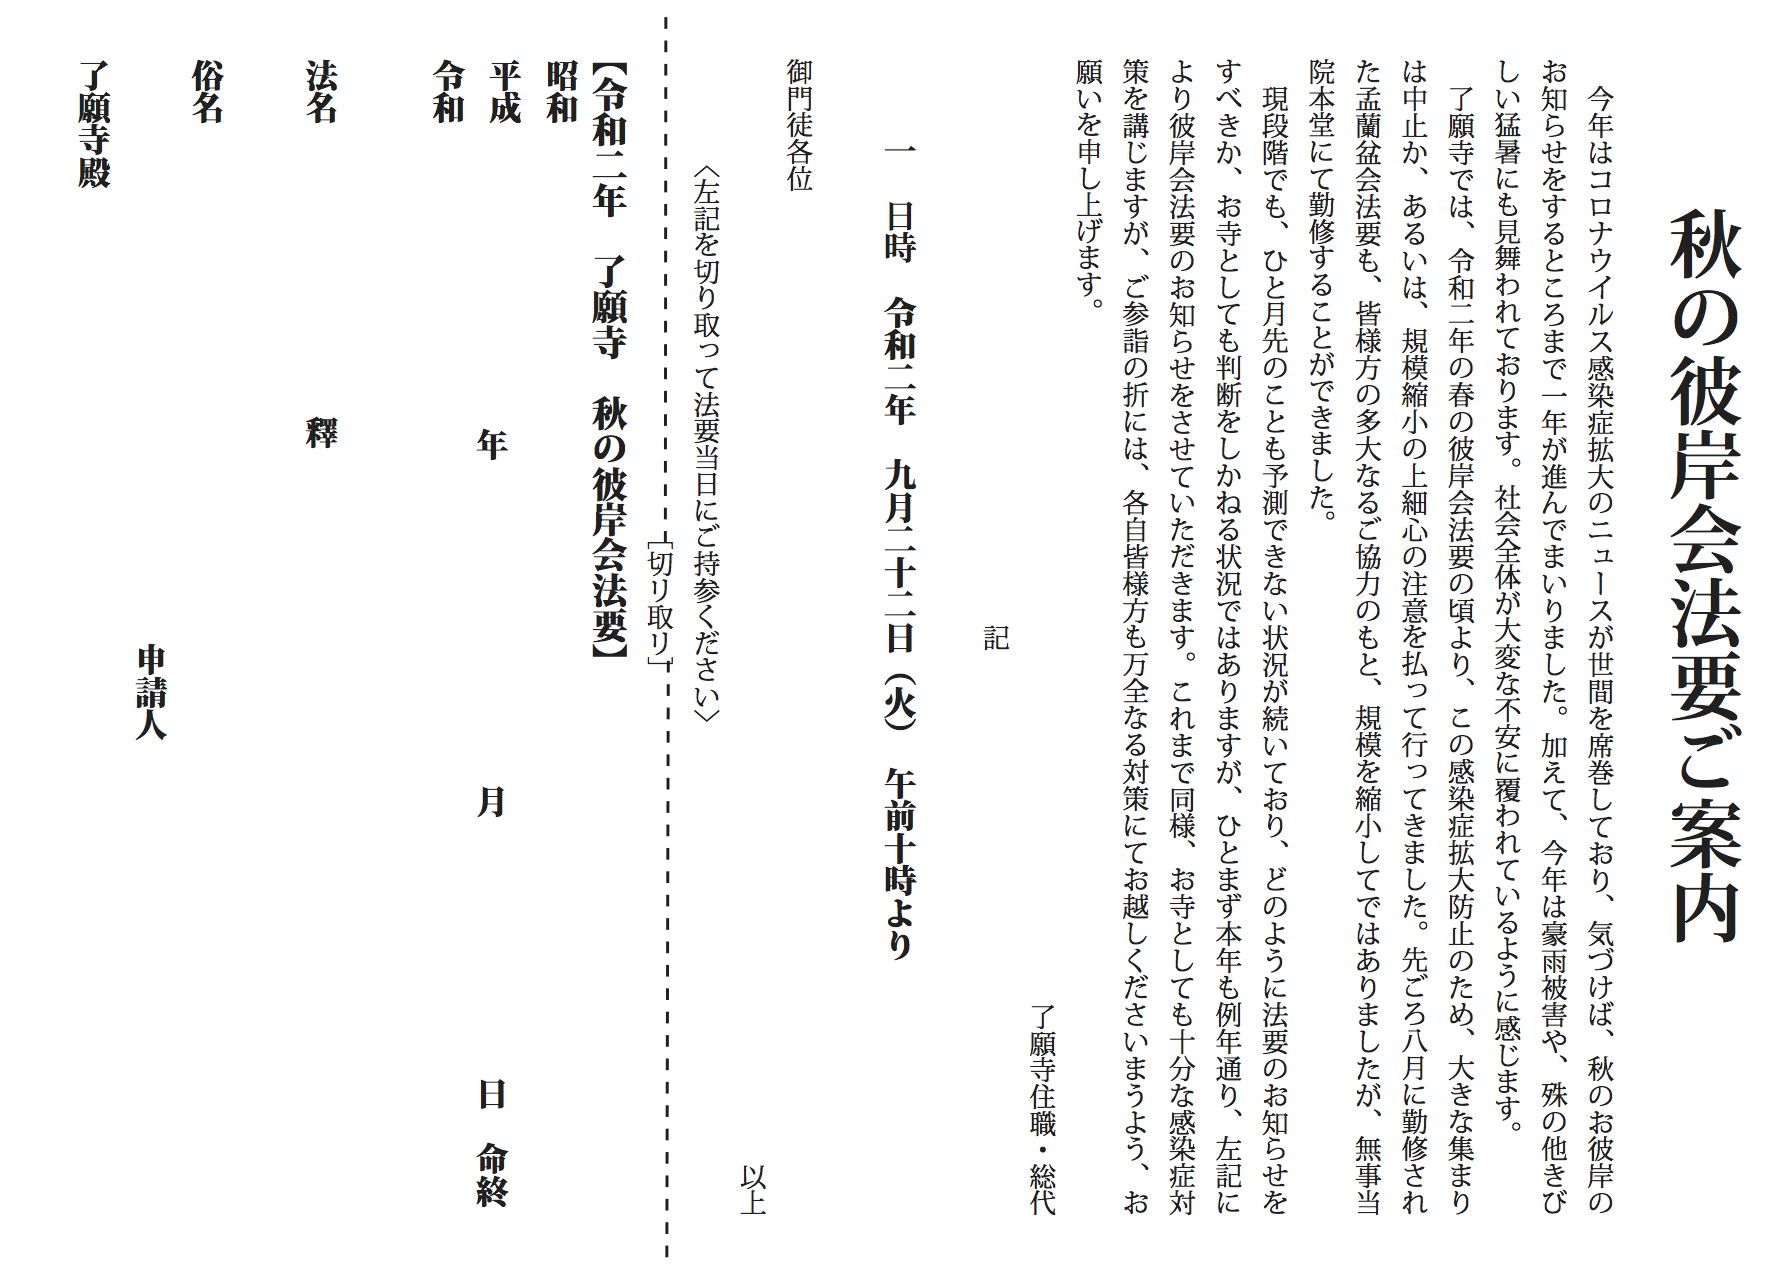 aki_higan_2020_annnai.png